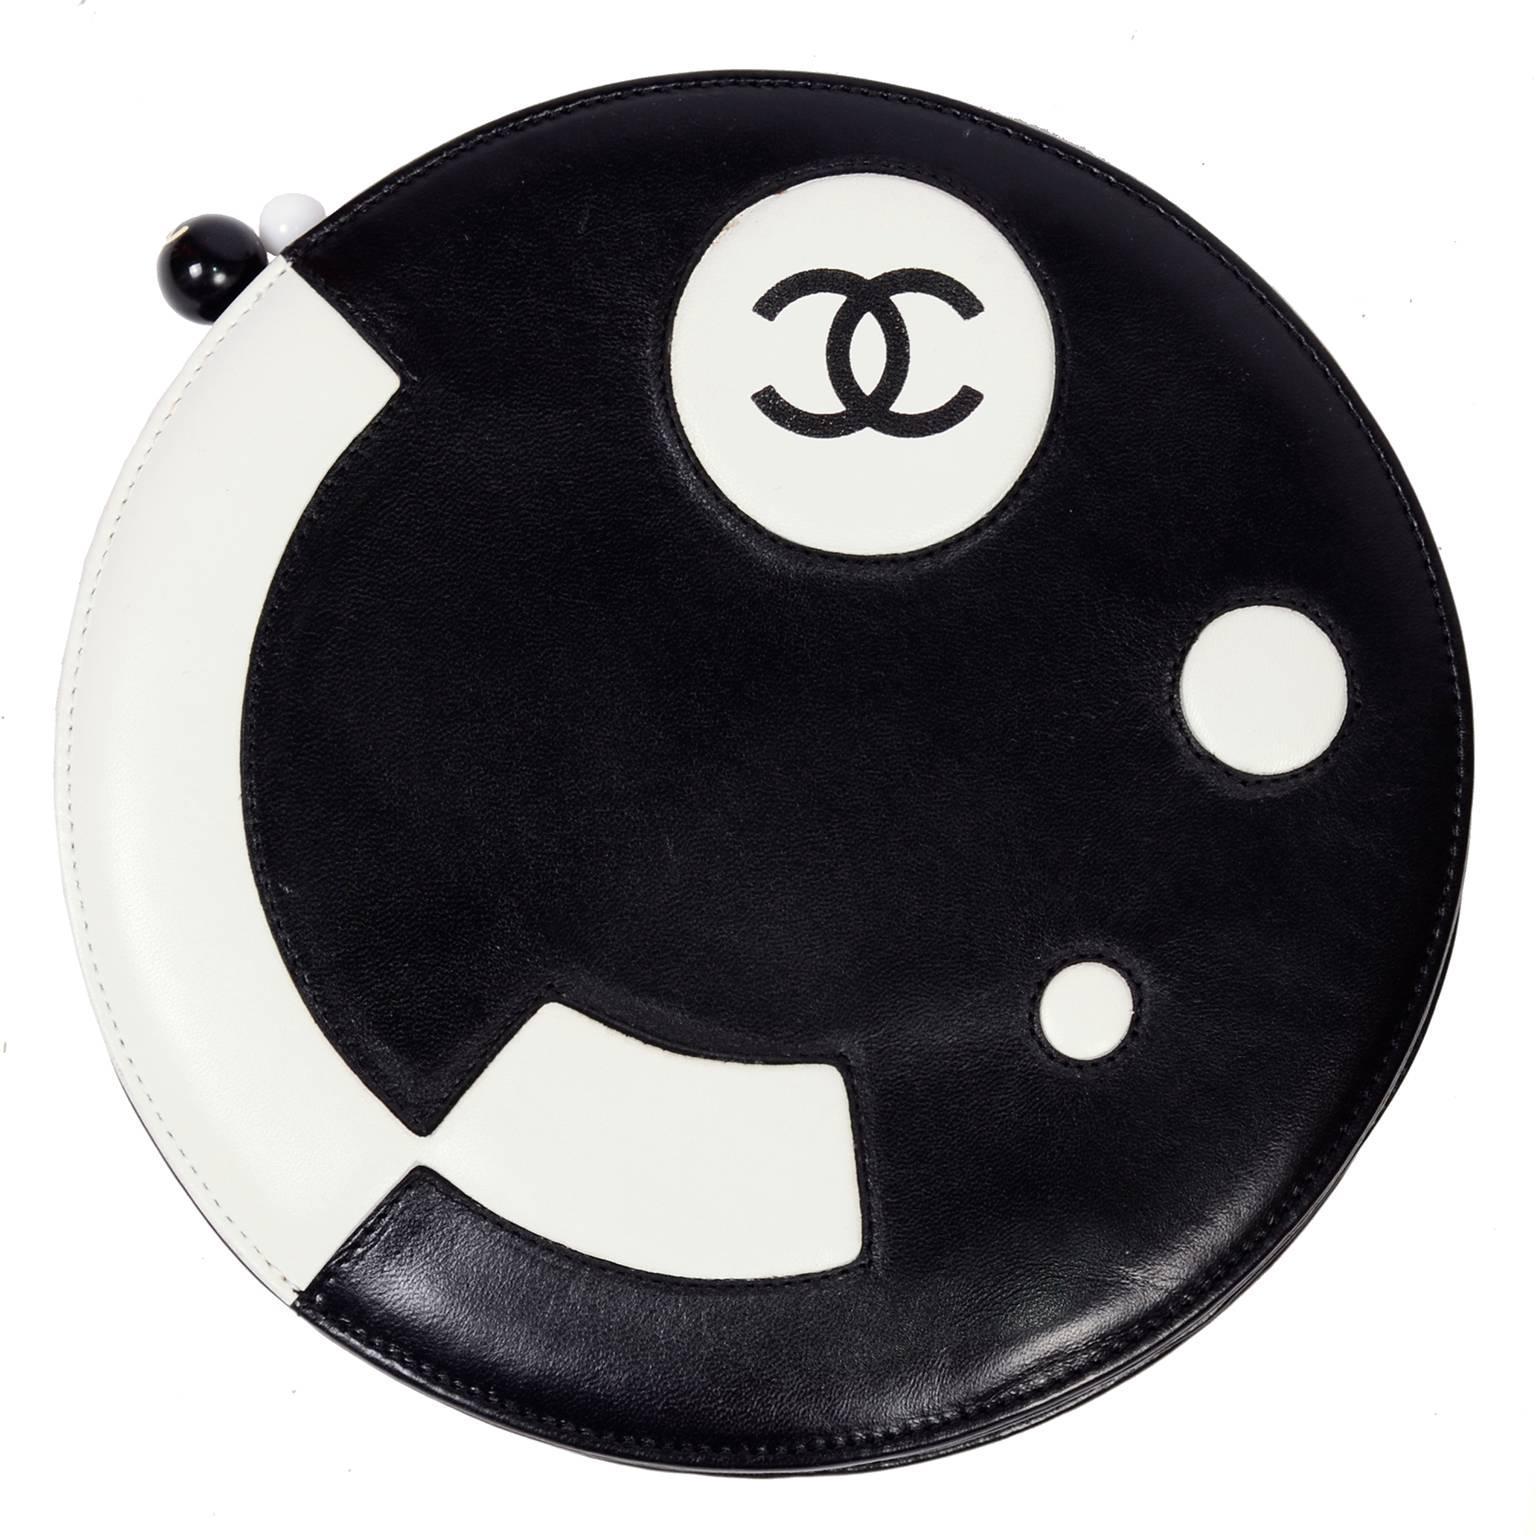 Rare Chanel Round Black & White Lambskin Handbag Circle Shoulder Bag or Clutch